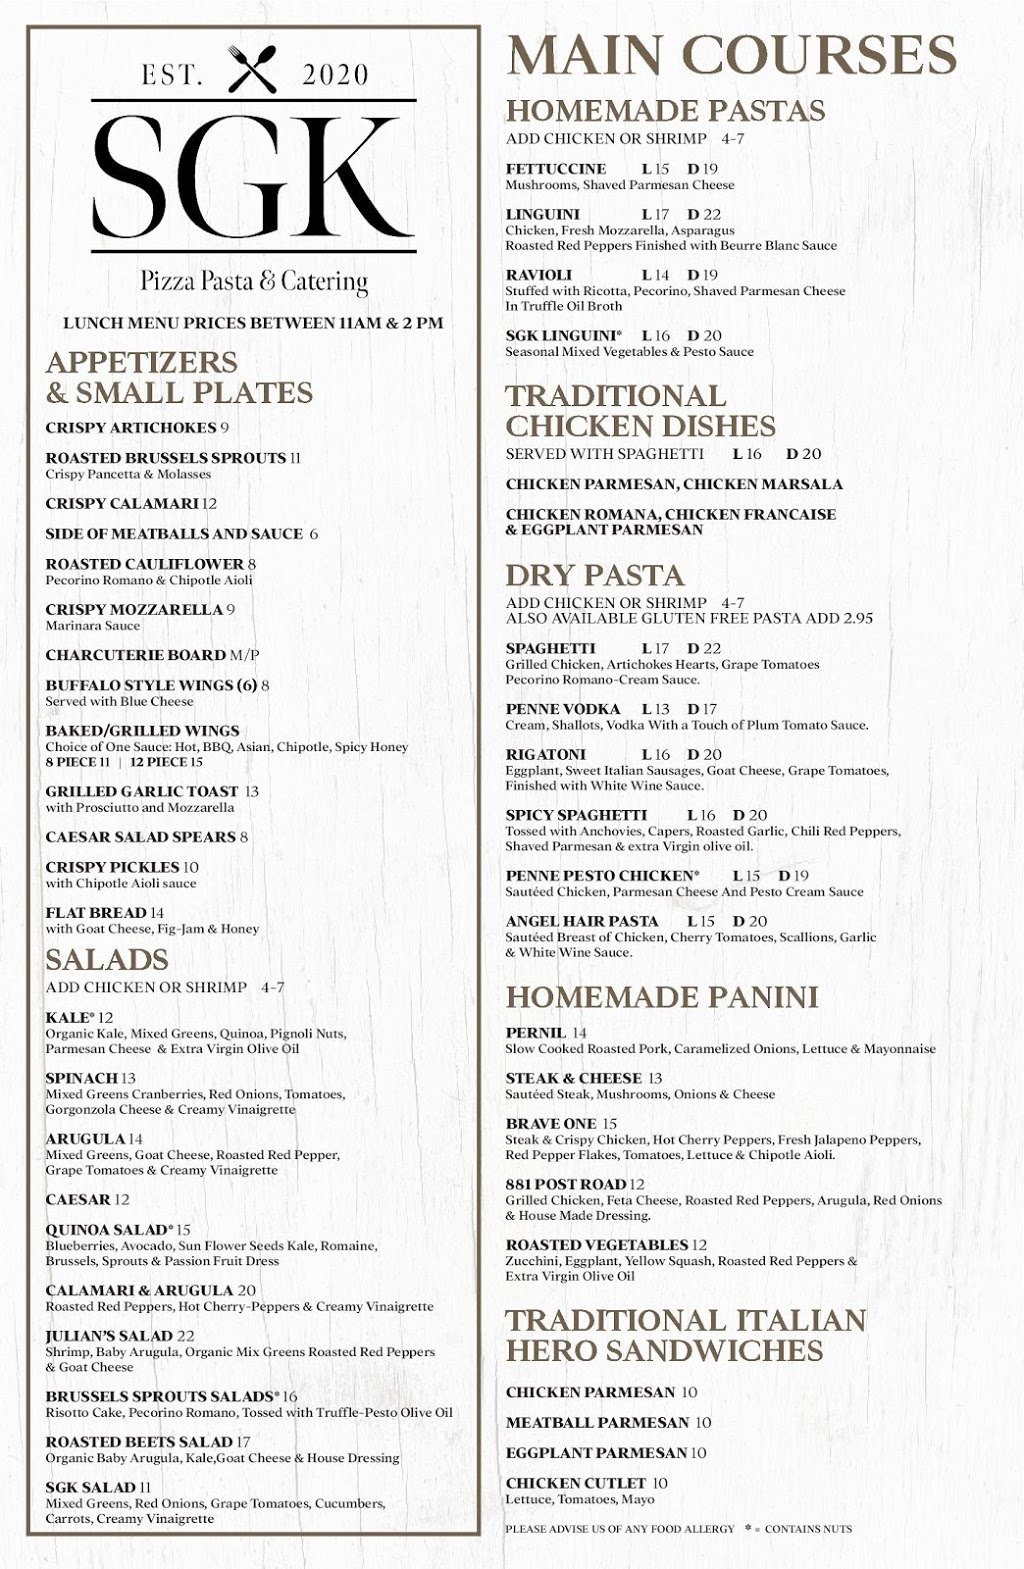 Sonia S Gourmet Kitchen Restaurant 881 Post Rd Fairfield Ct 06824 Usa